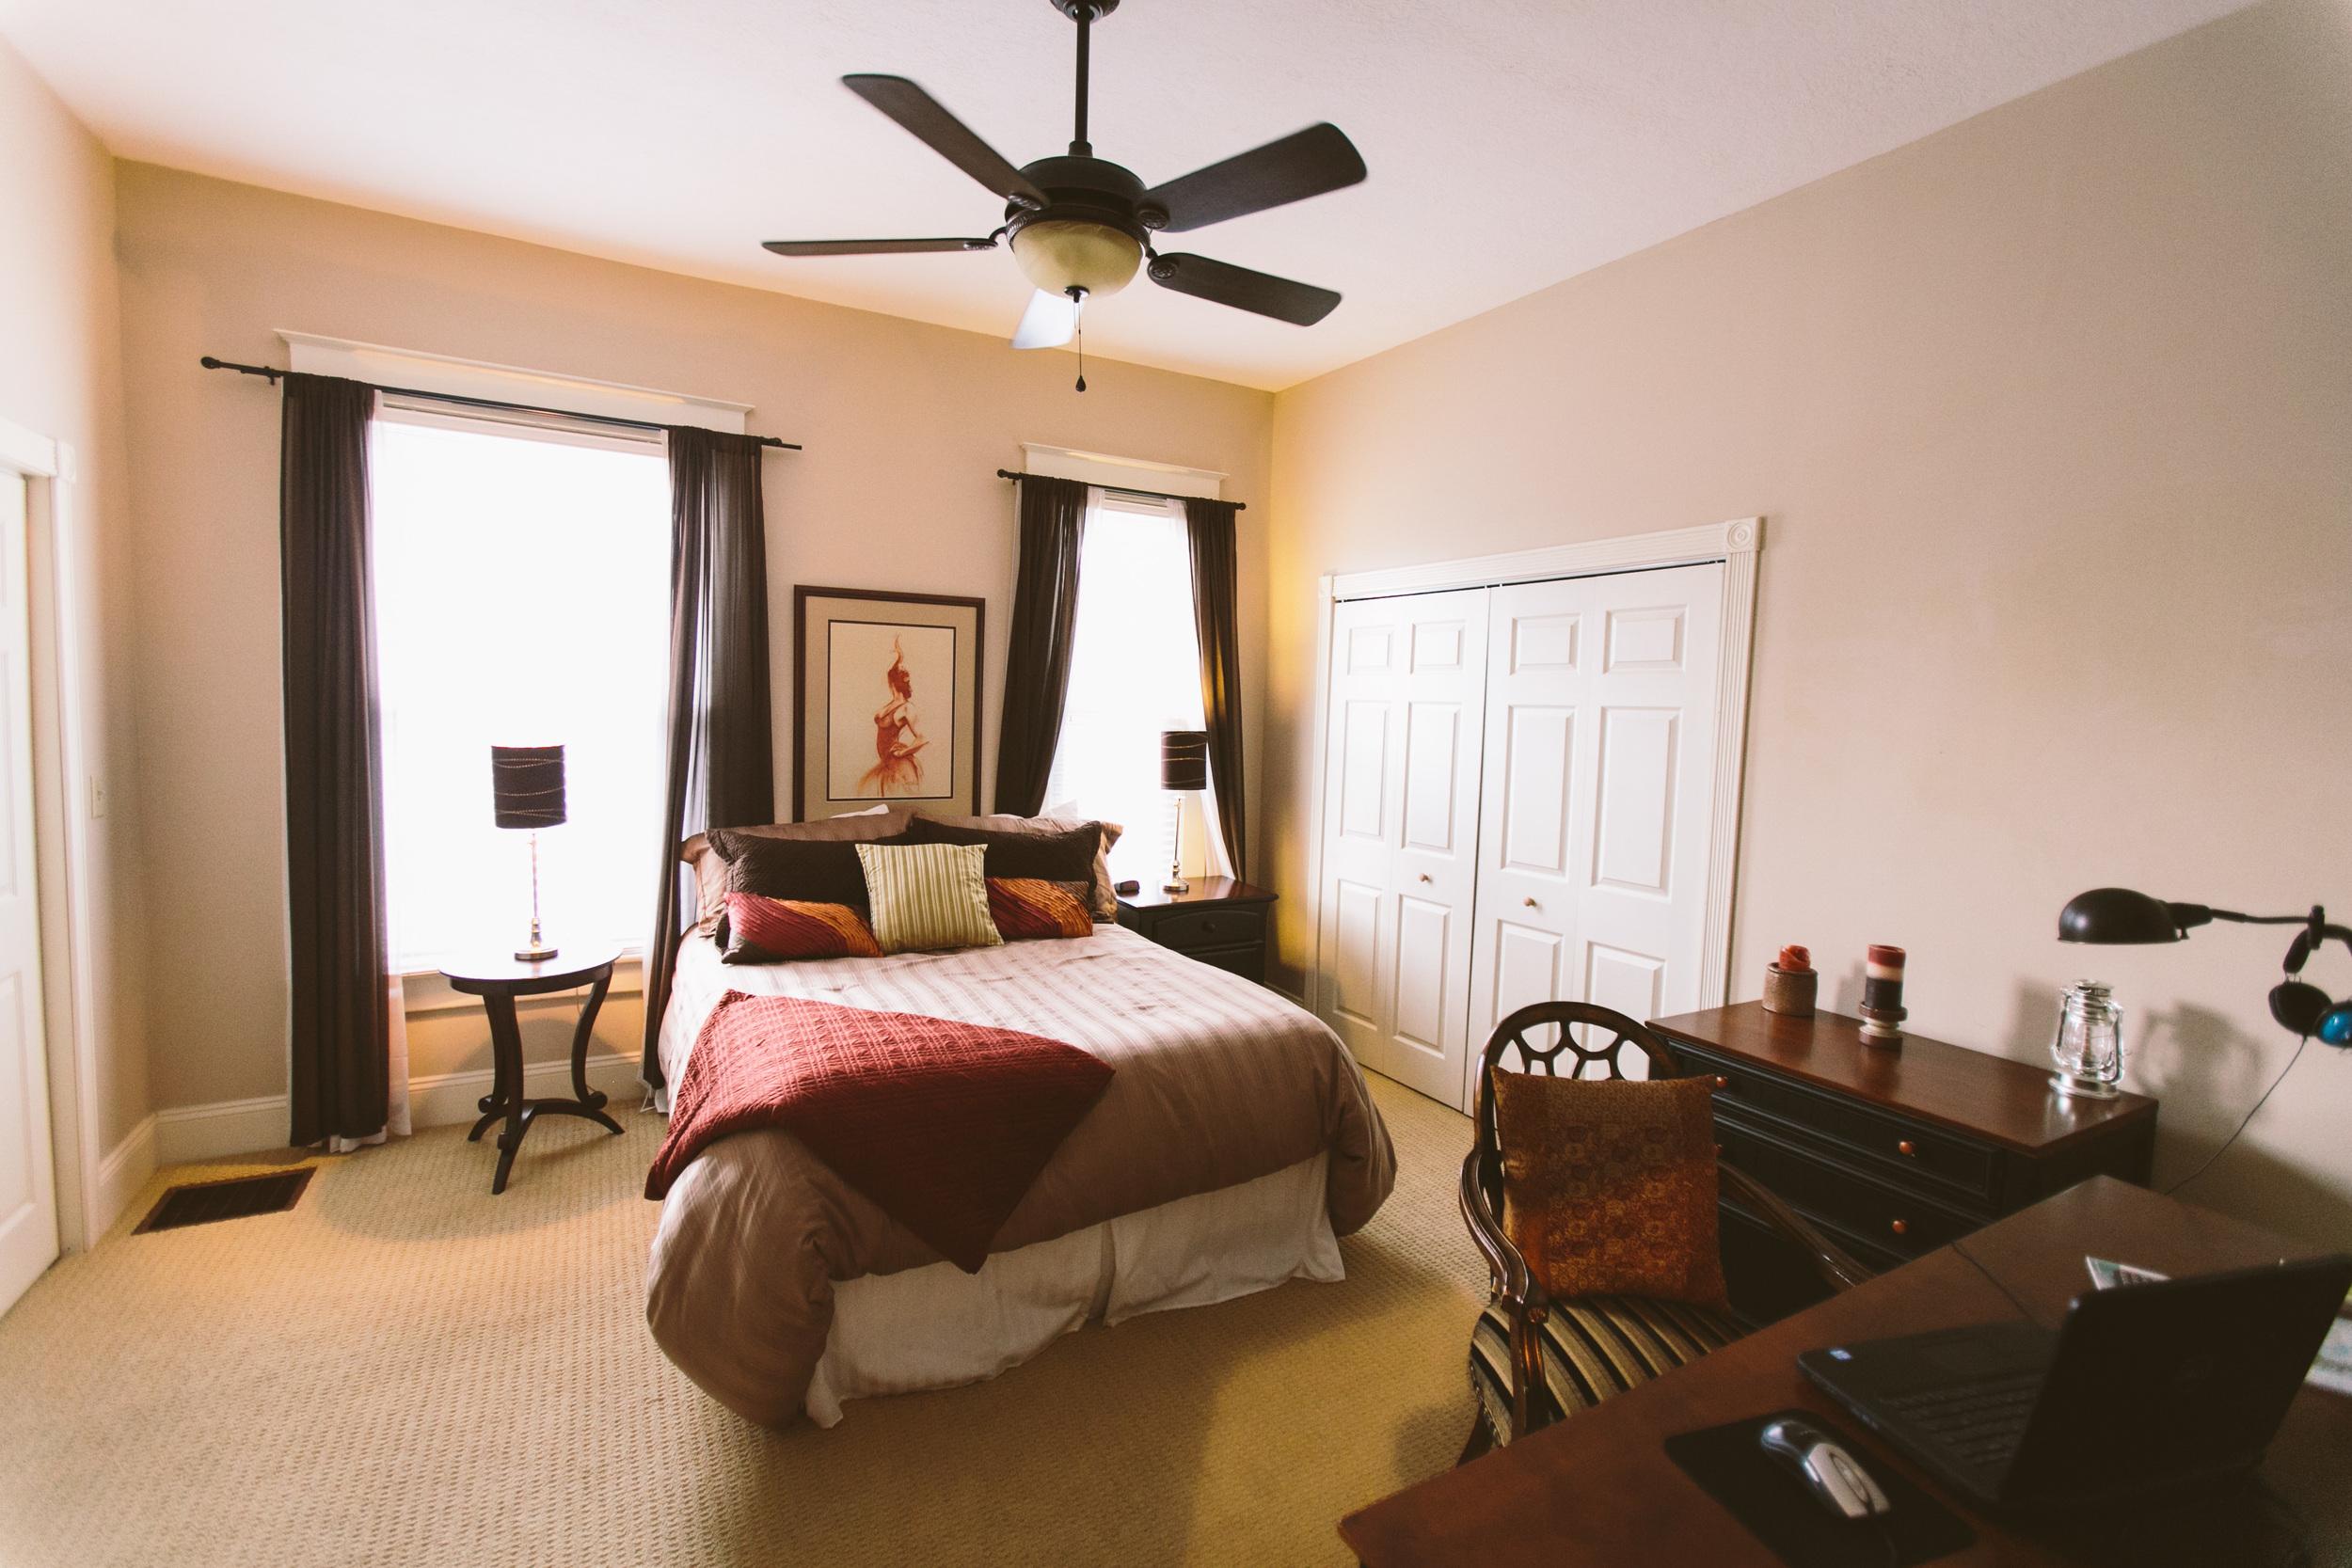 The Mount Vernon Inn - Apartments and Houses-26.jpg